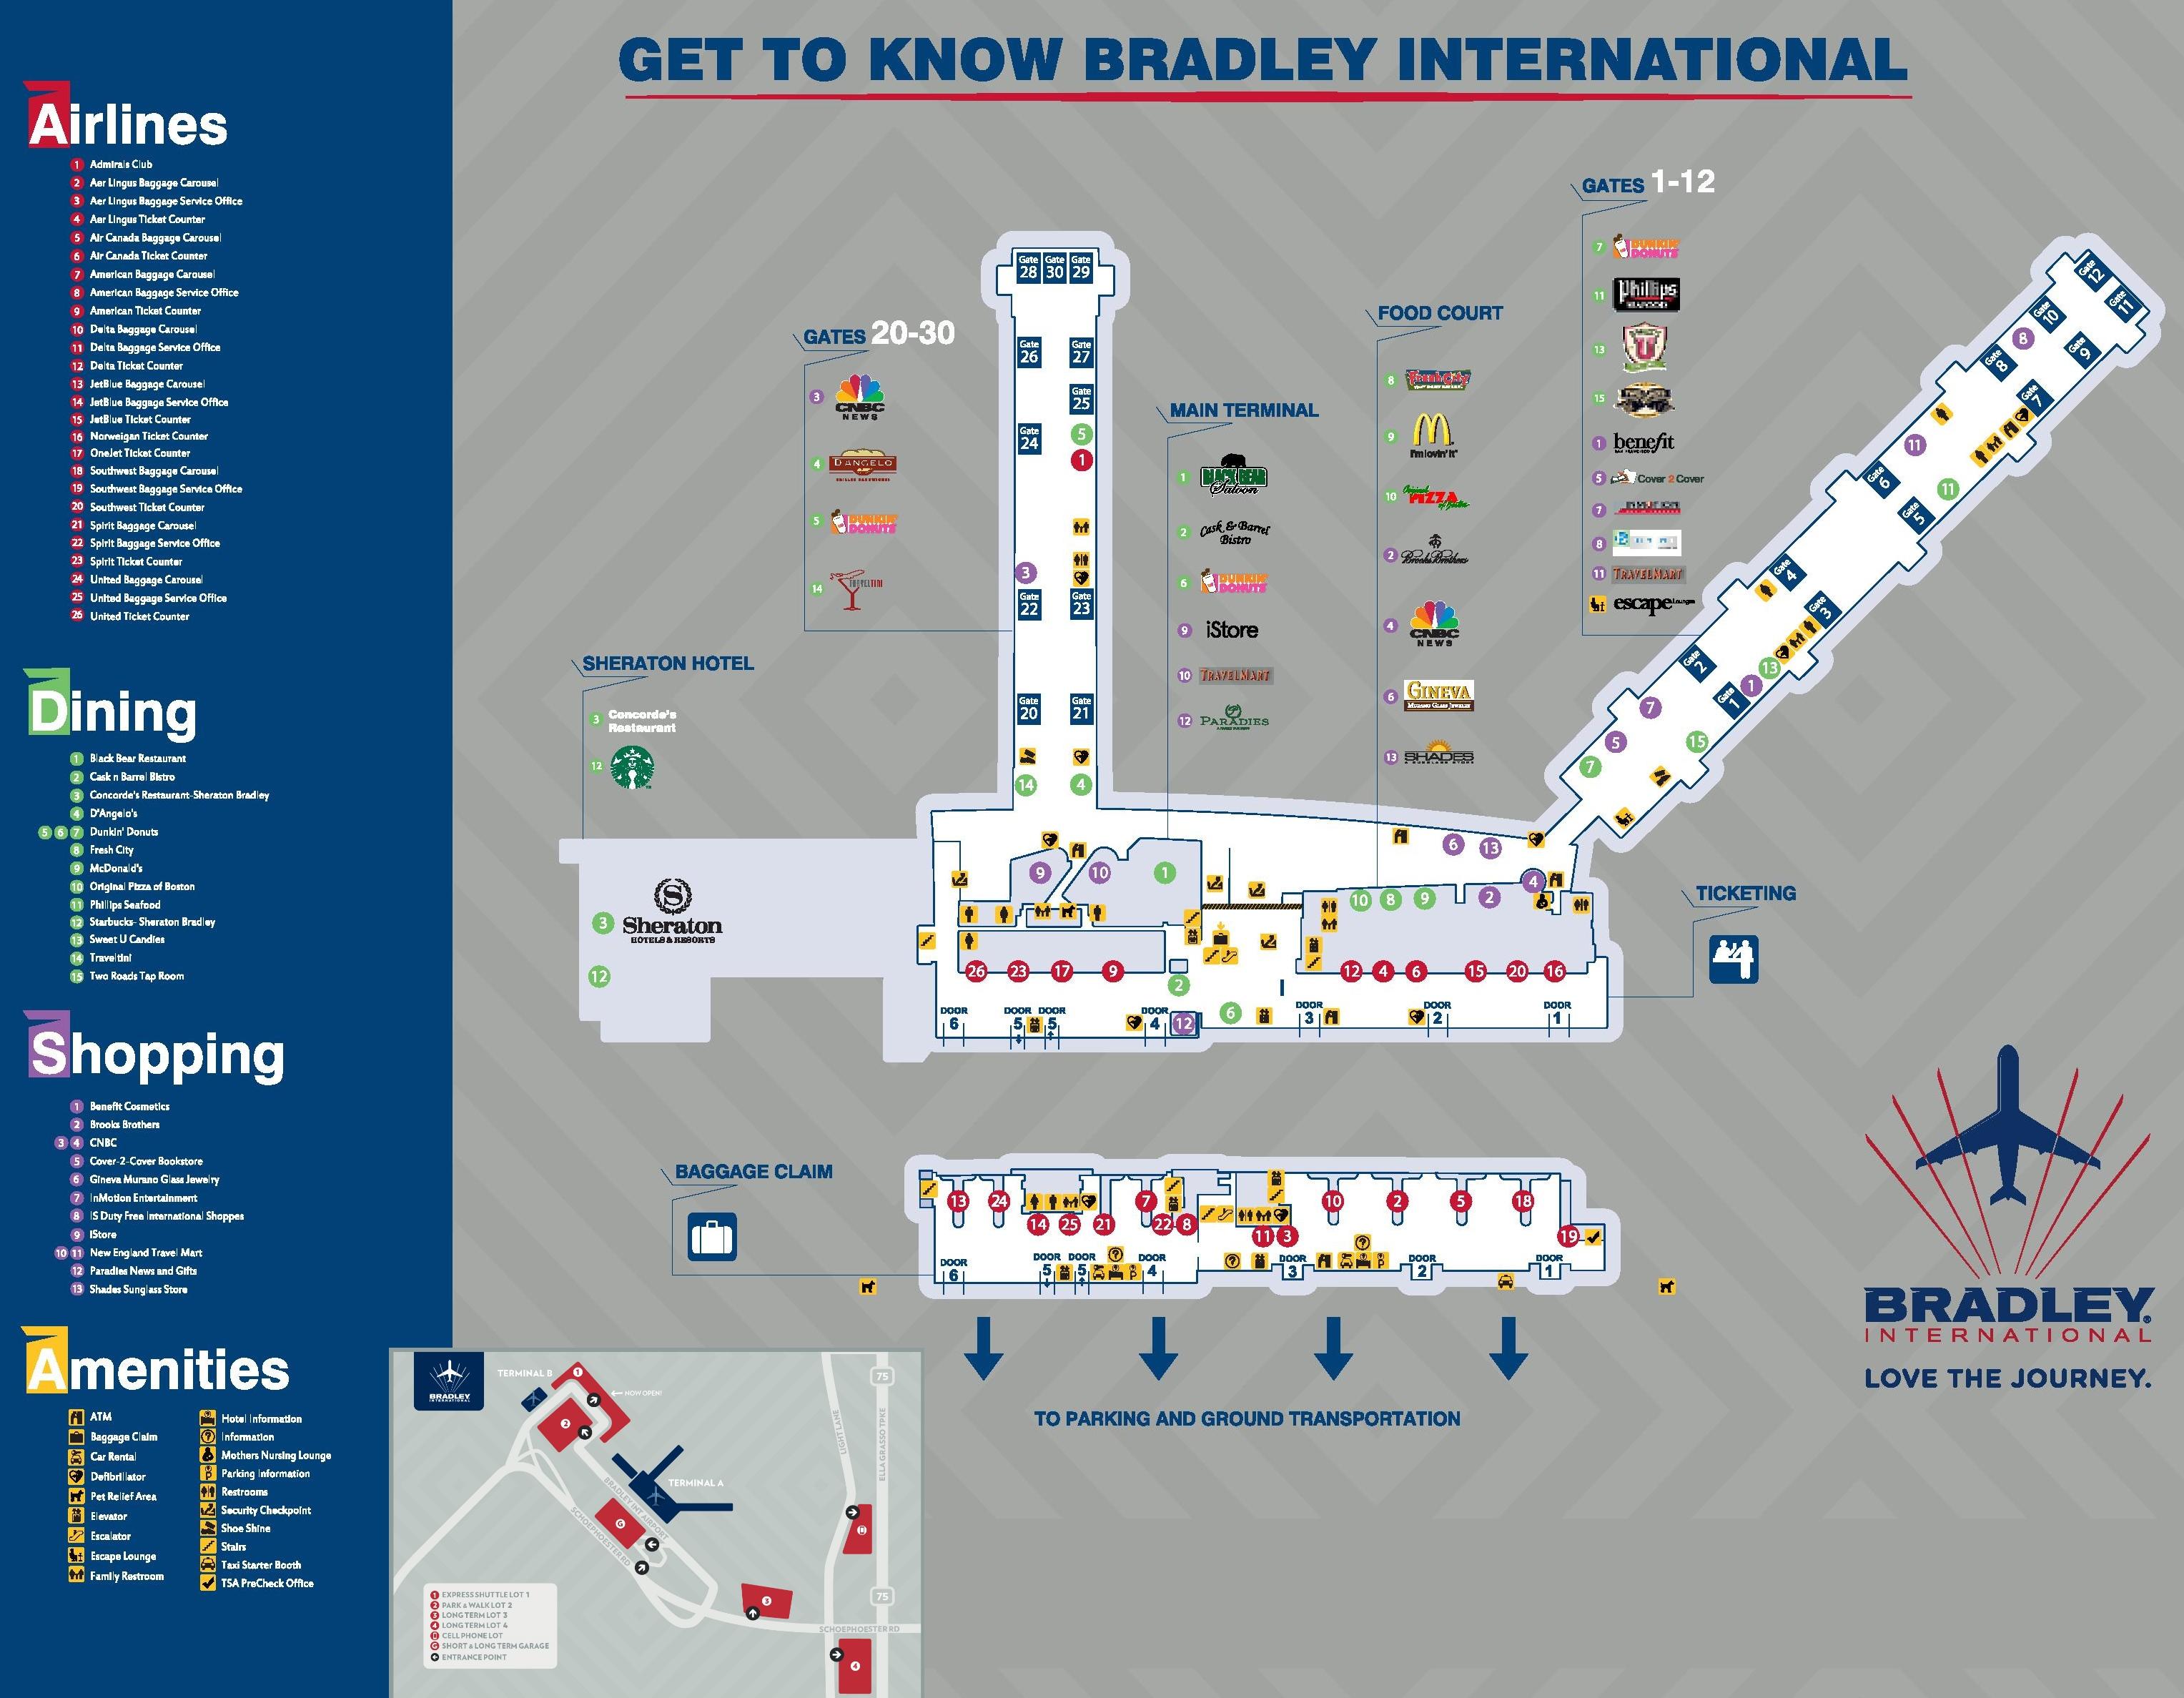 bradley international airport map